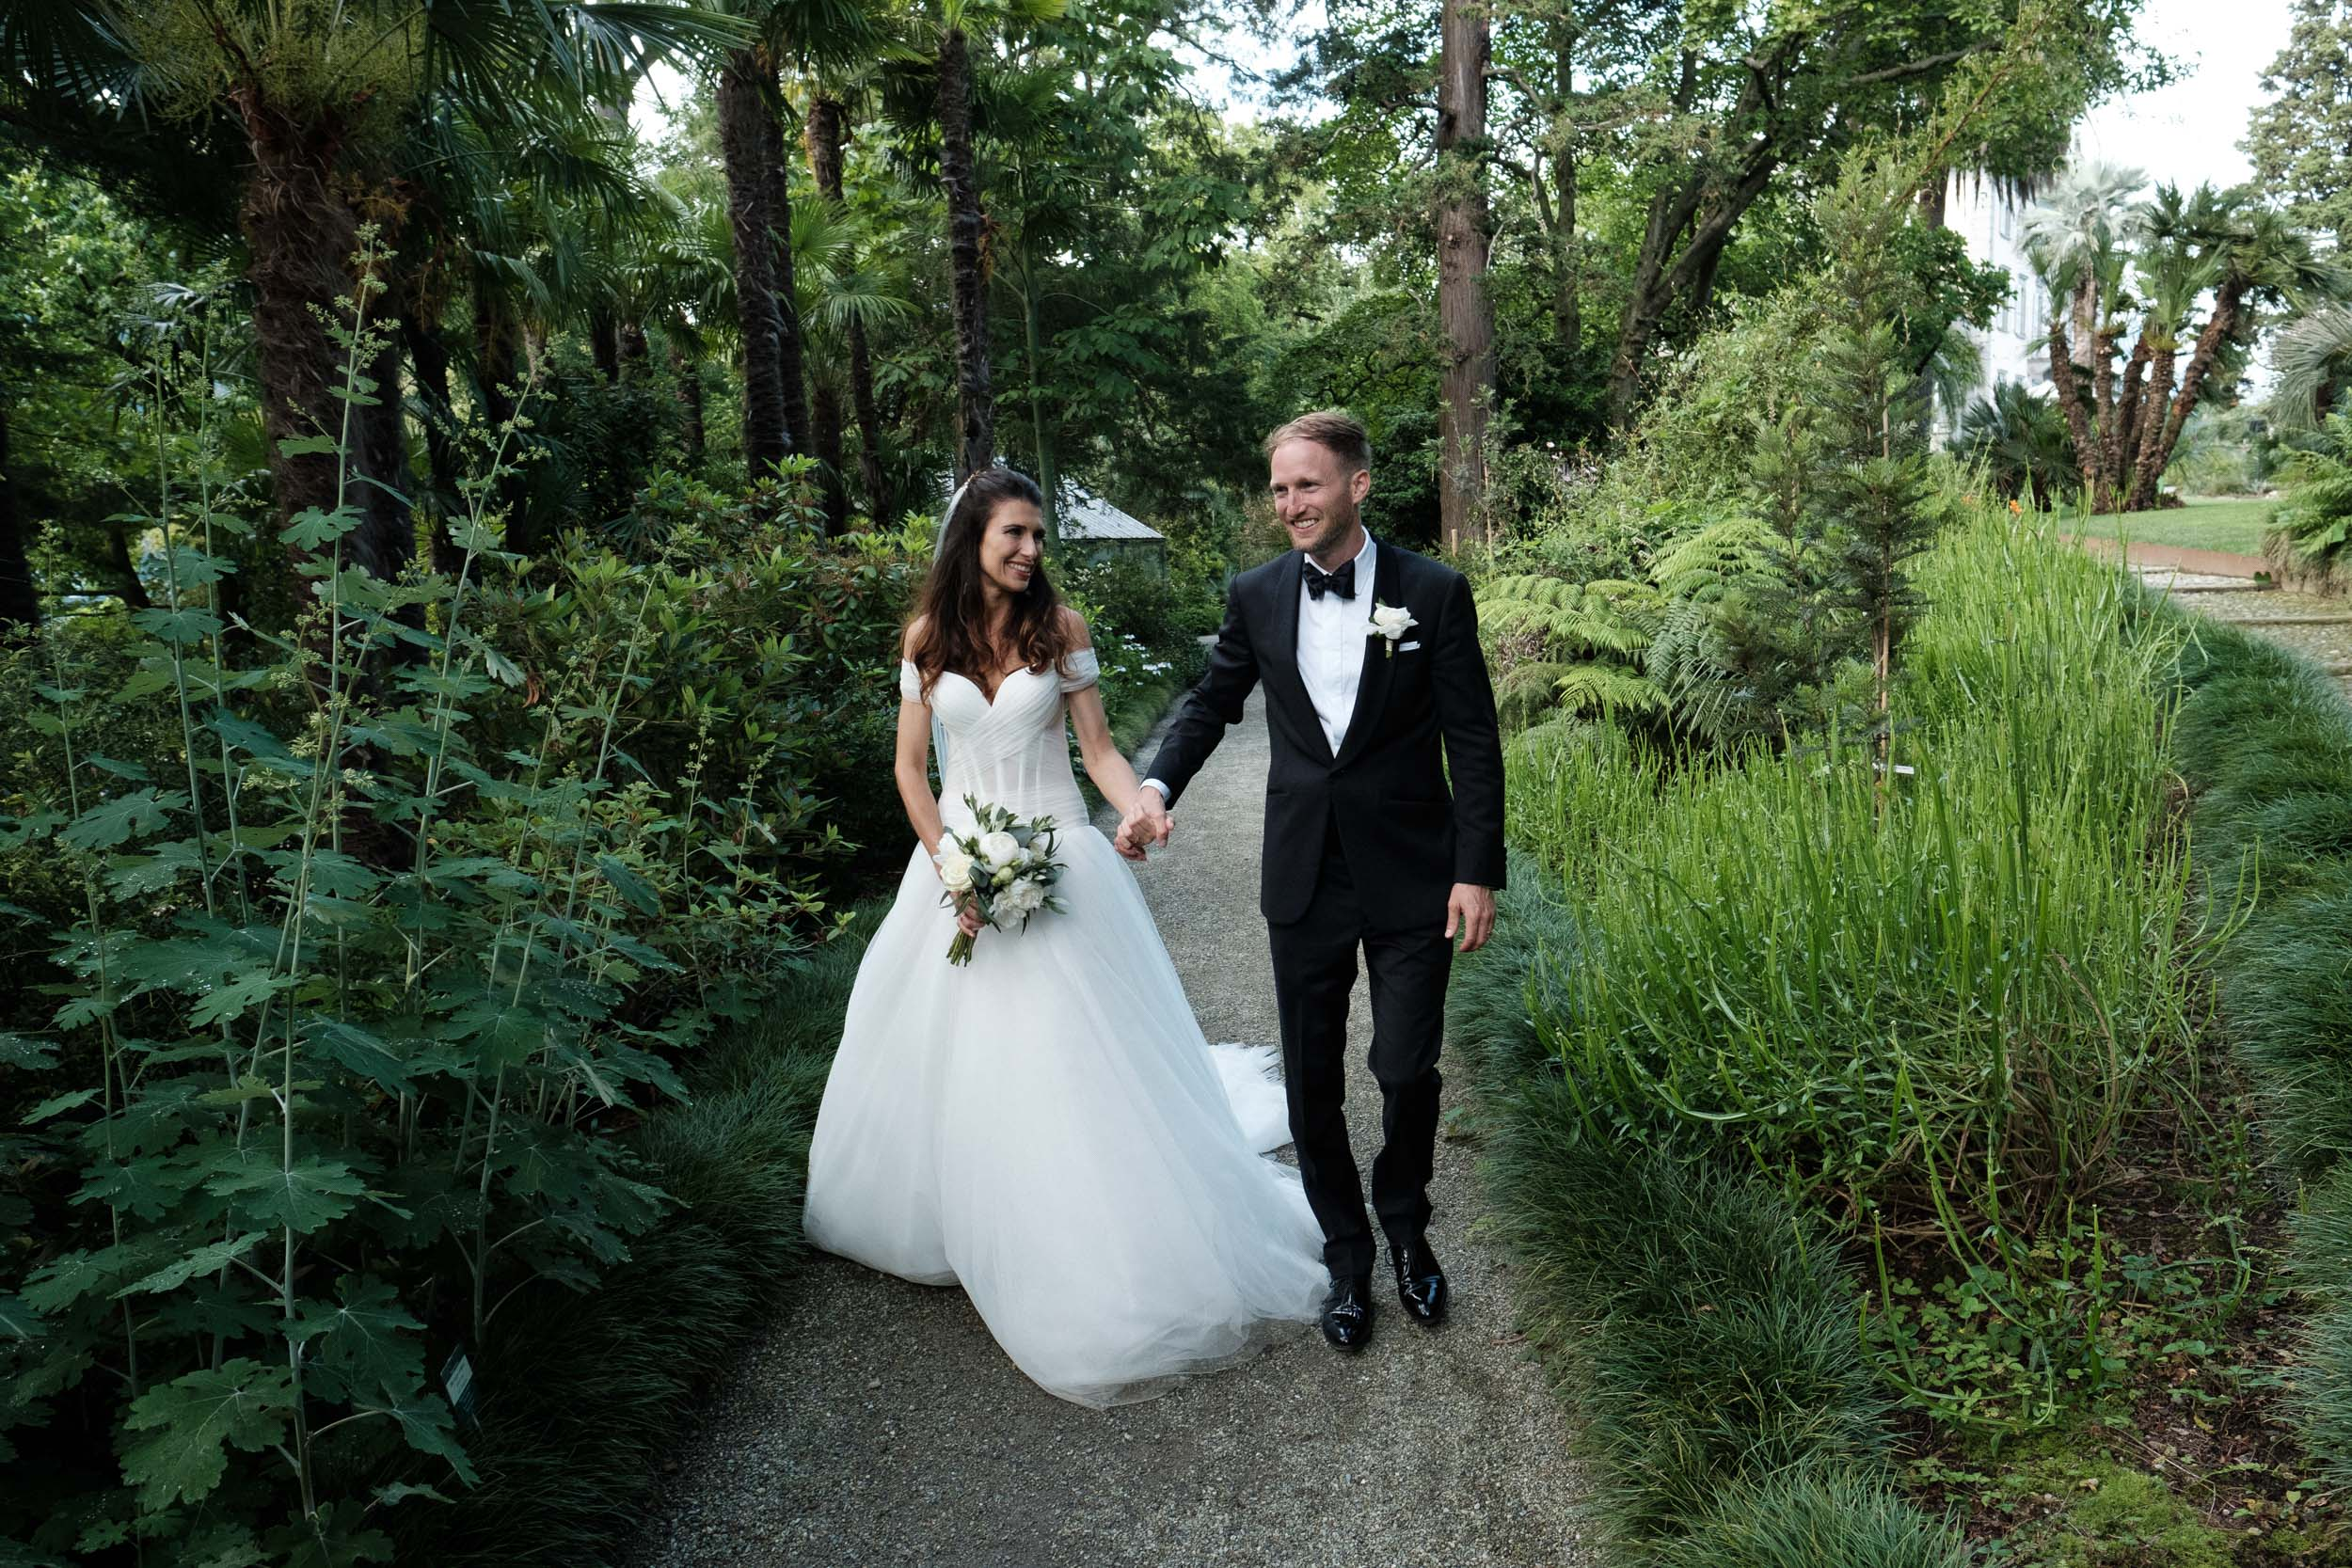 olivia-andreas-wedding-switzerland-388.jpg